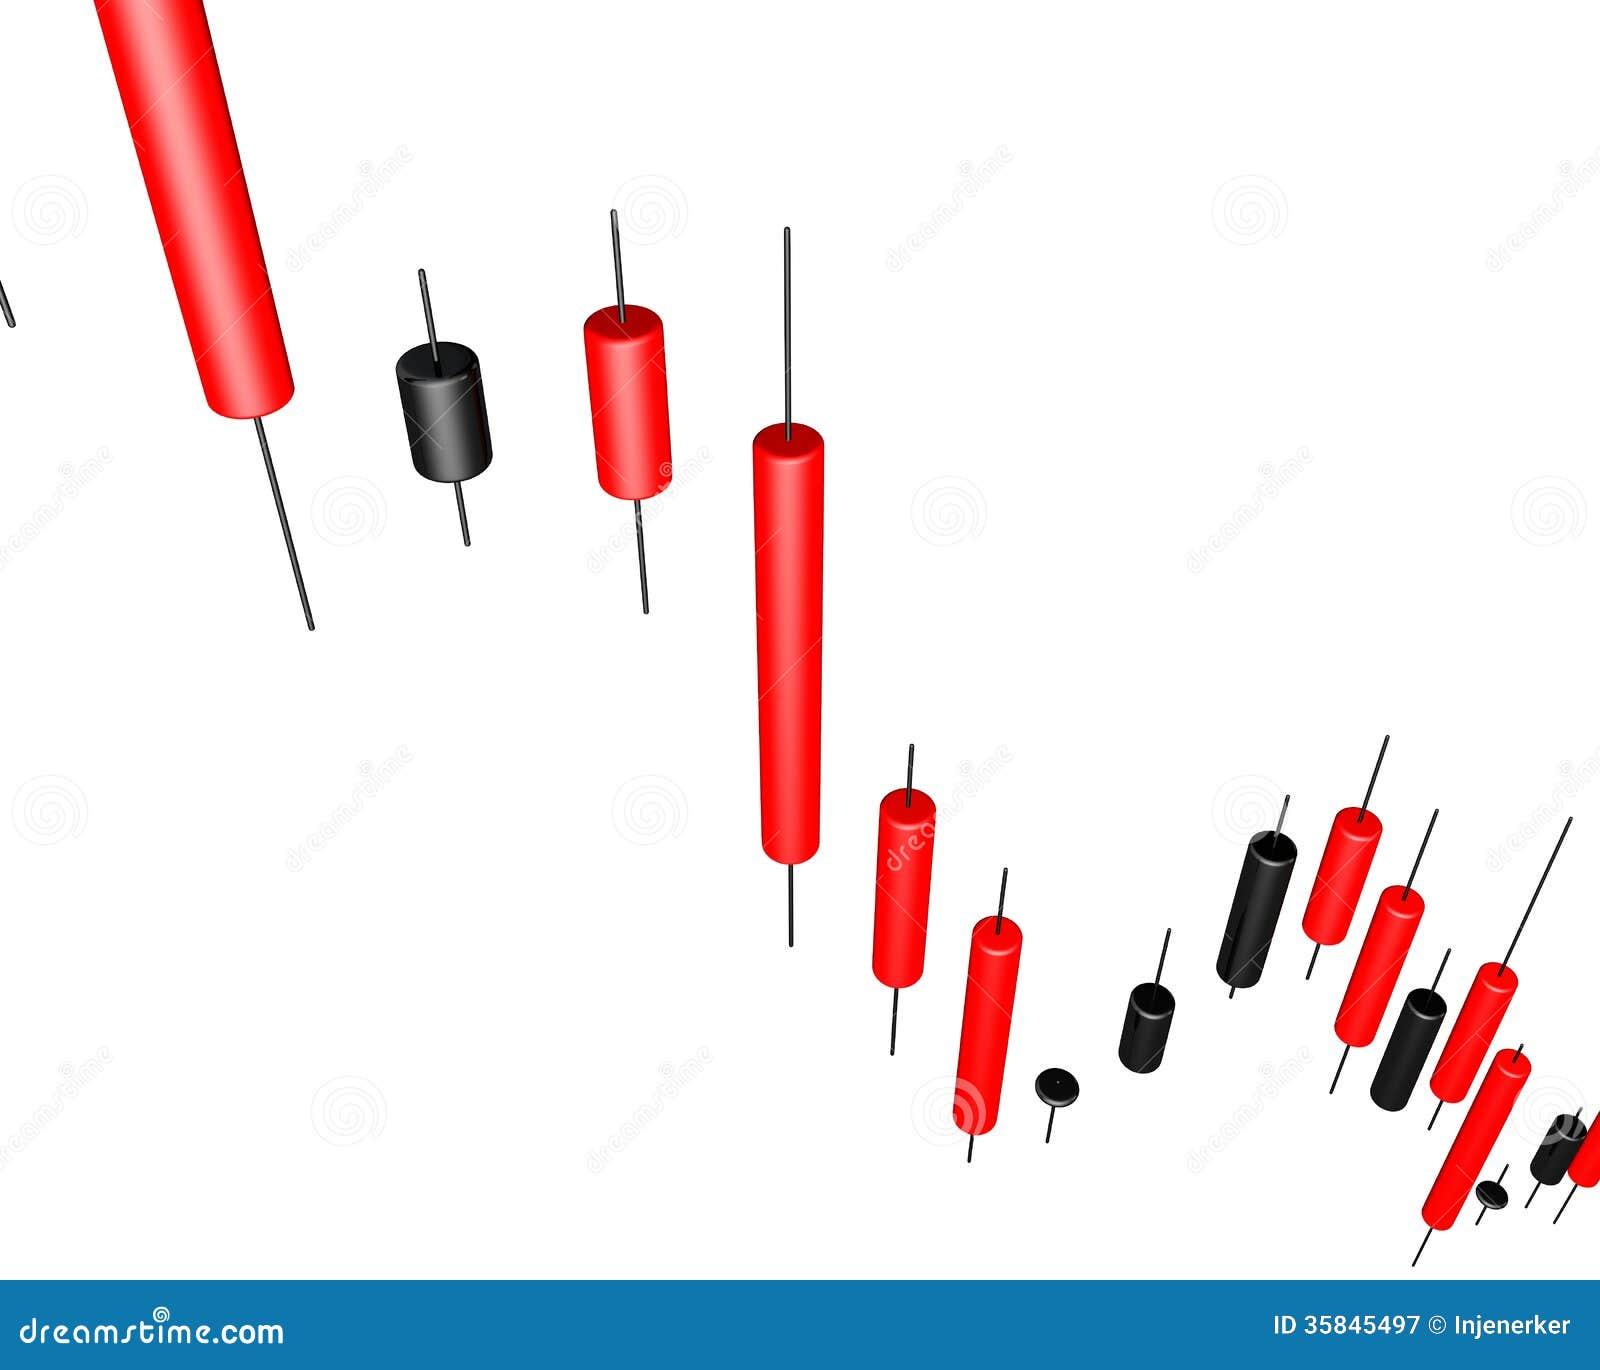 Candlesticks forex white background